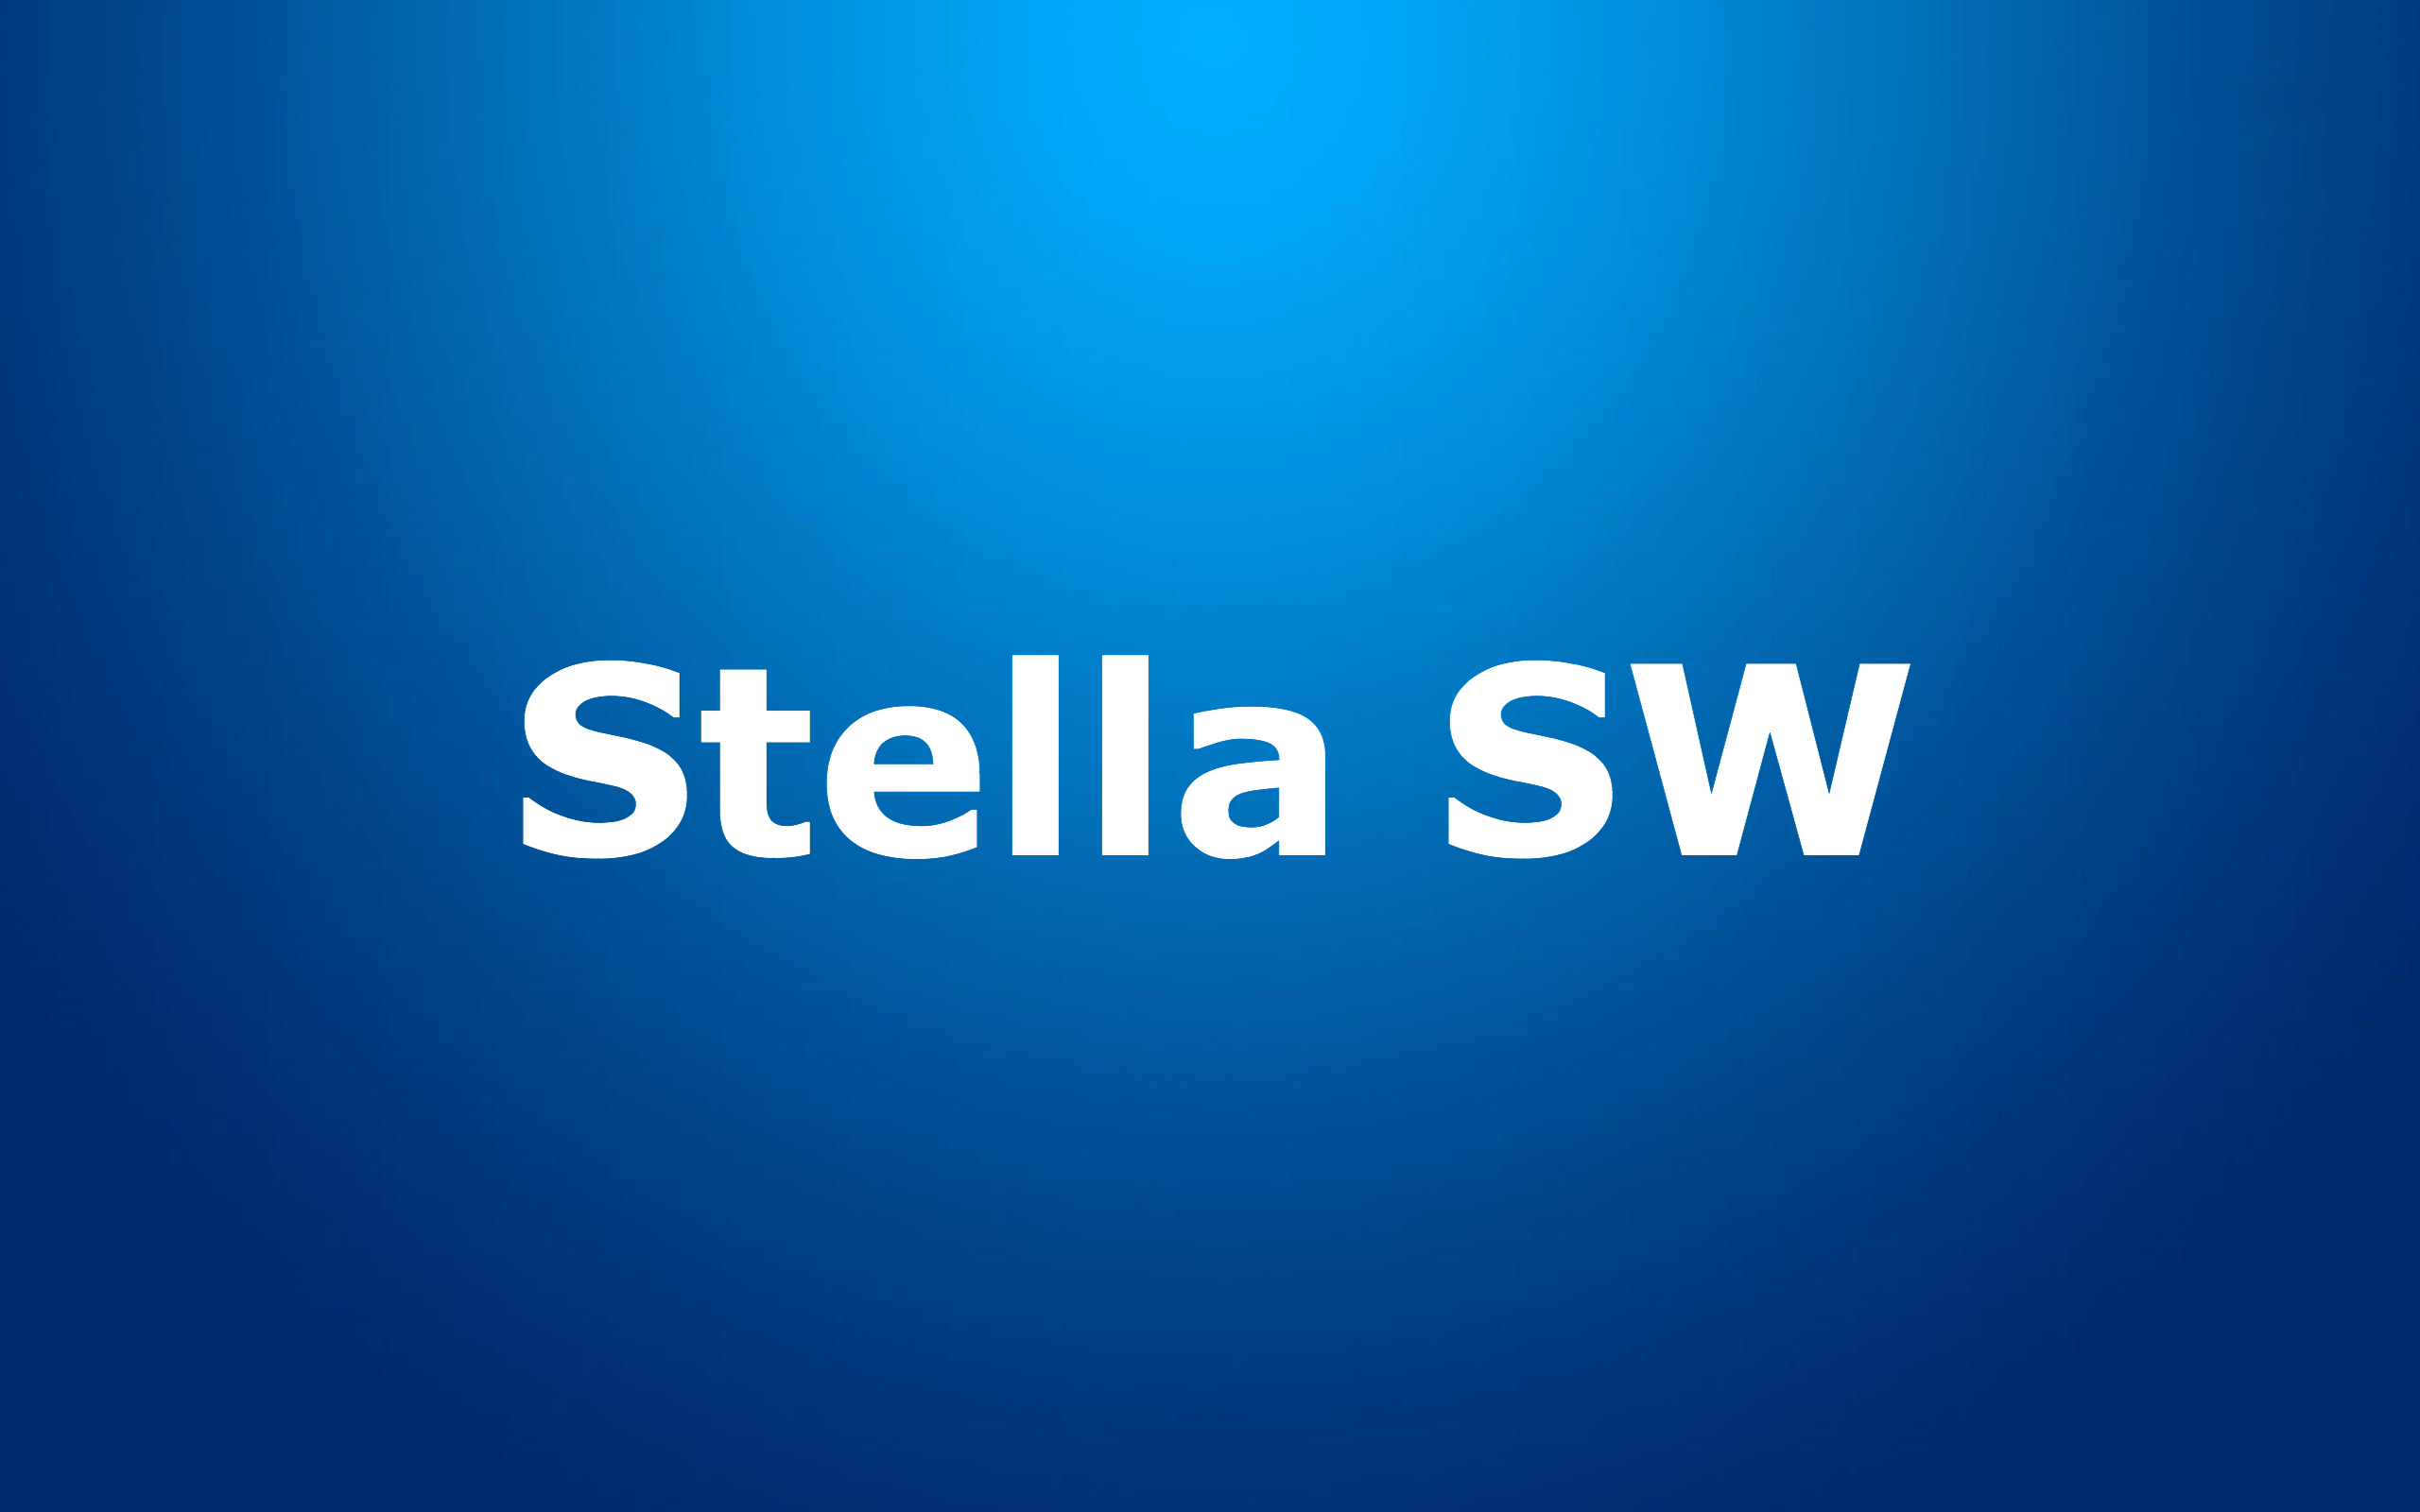 Stella SW